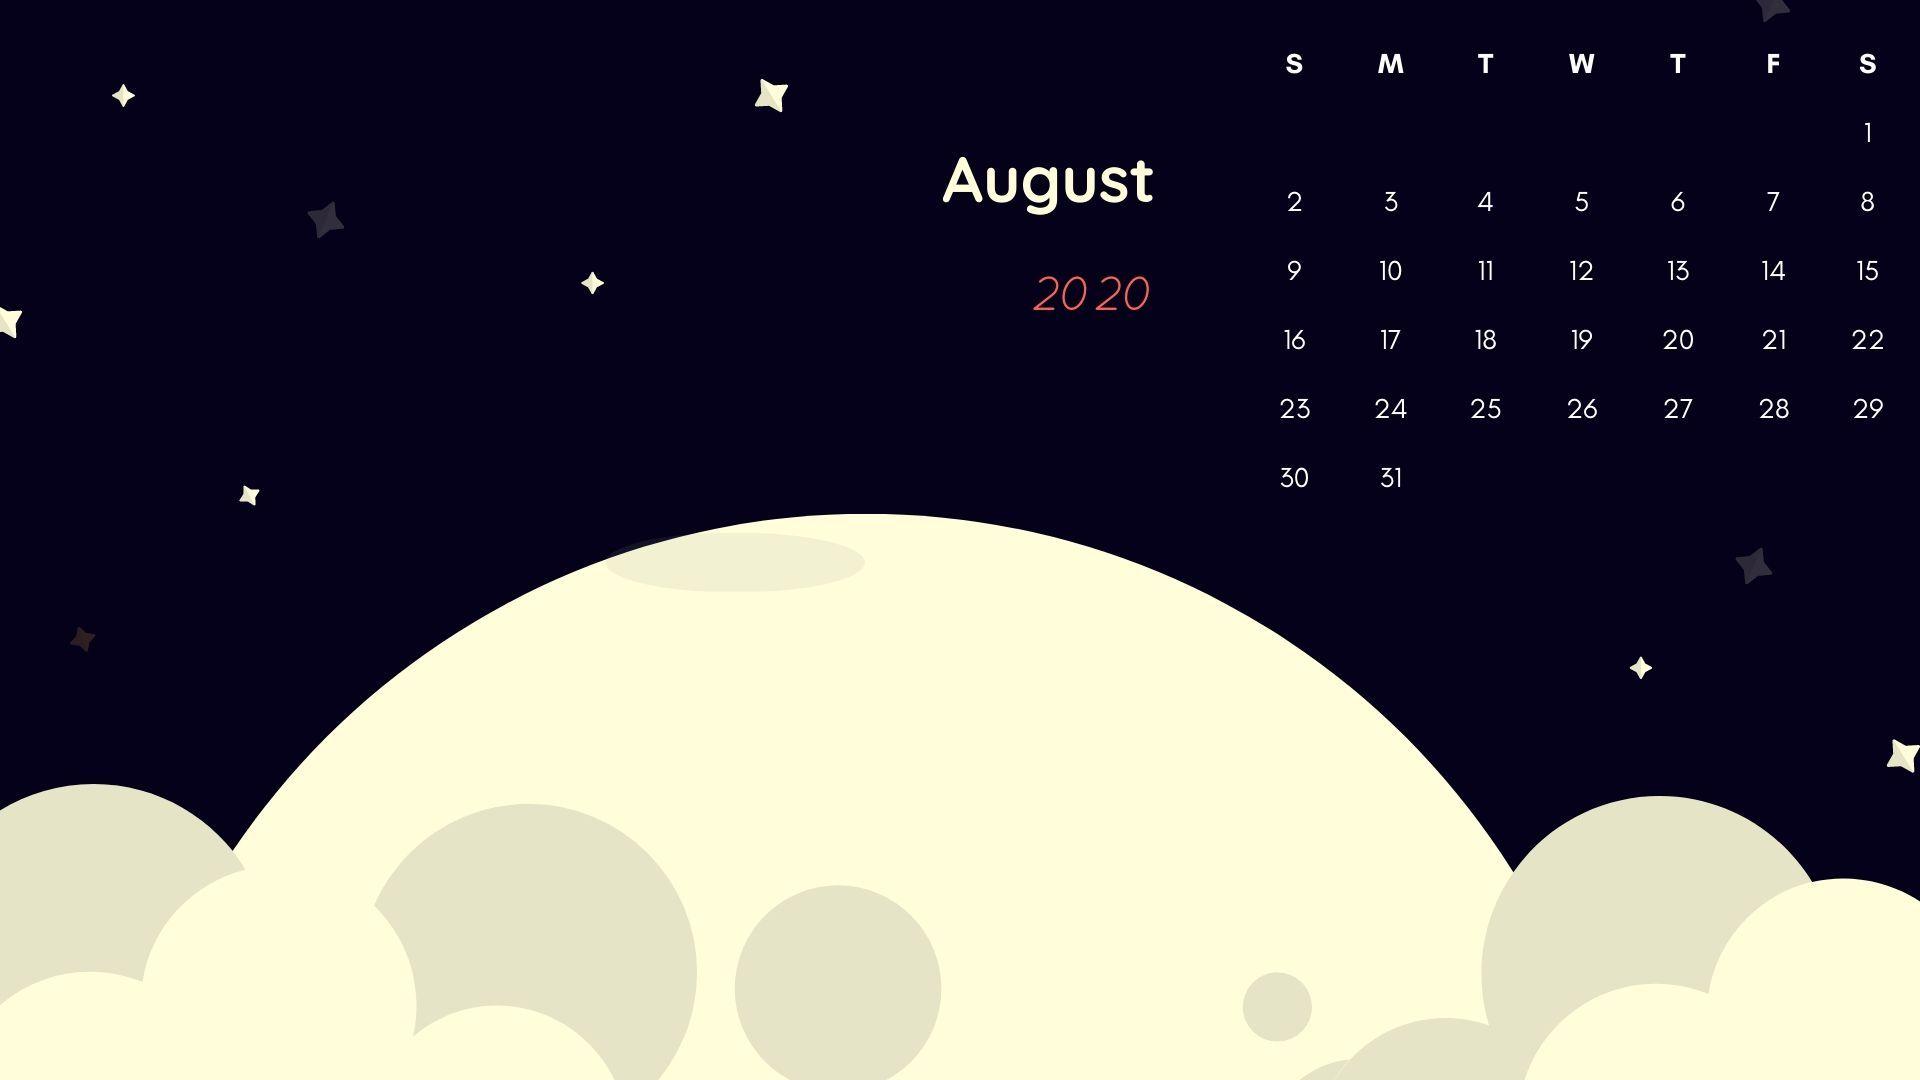 Download August 2020 Desktop Calendar Wallpaper Free For Computer Desktop Background In 2020 Desktop Calendar Calendar Wallpaper Backgrounds Desktop